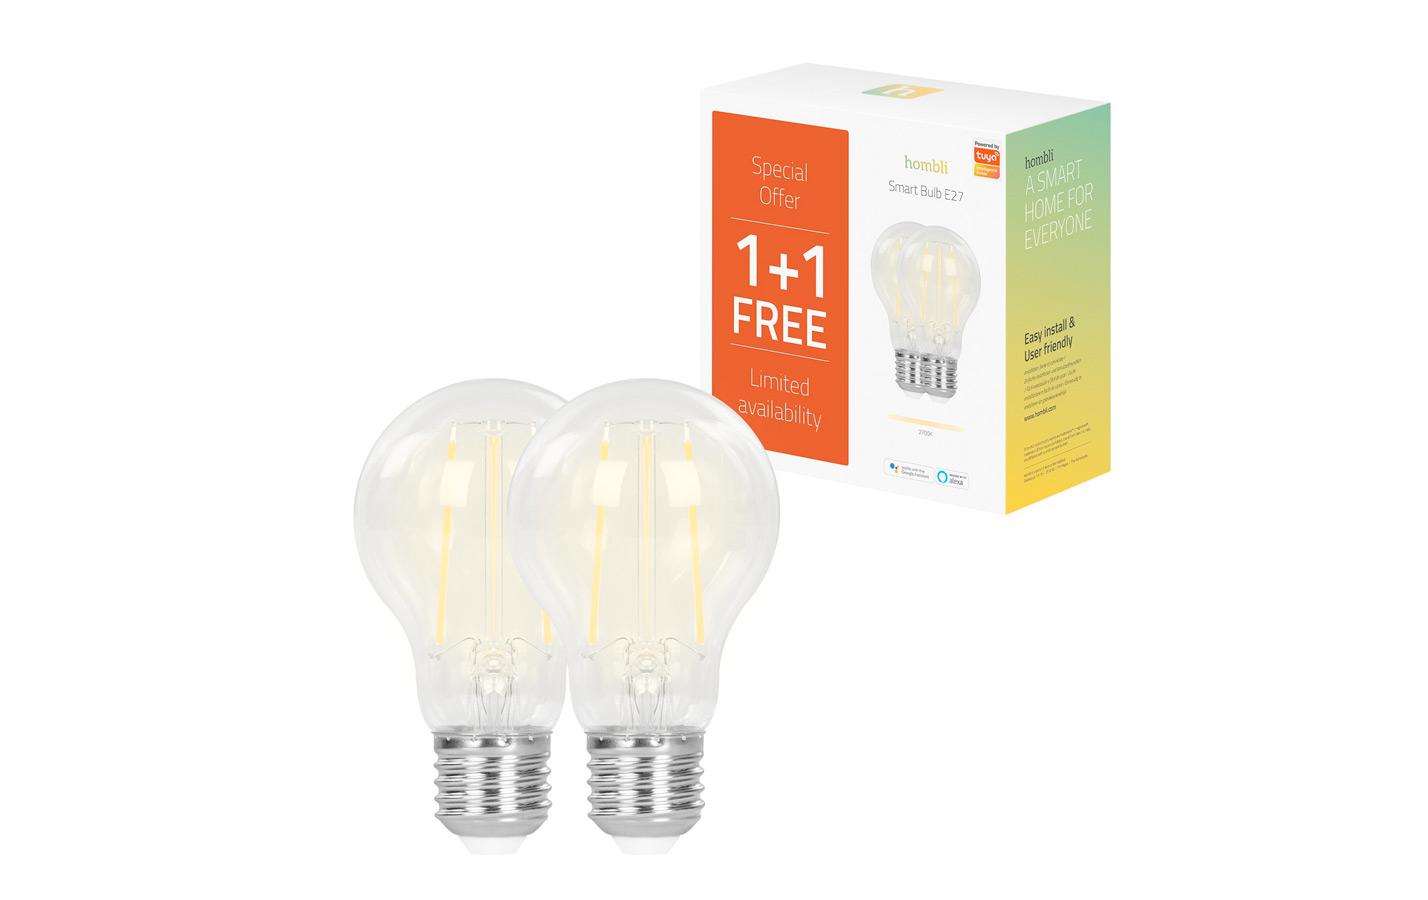 Hombli Slimme Filament Lamp E27 7W WiFi 1 + 1 gratis